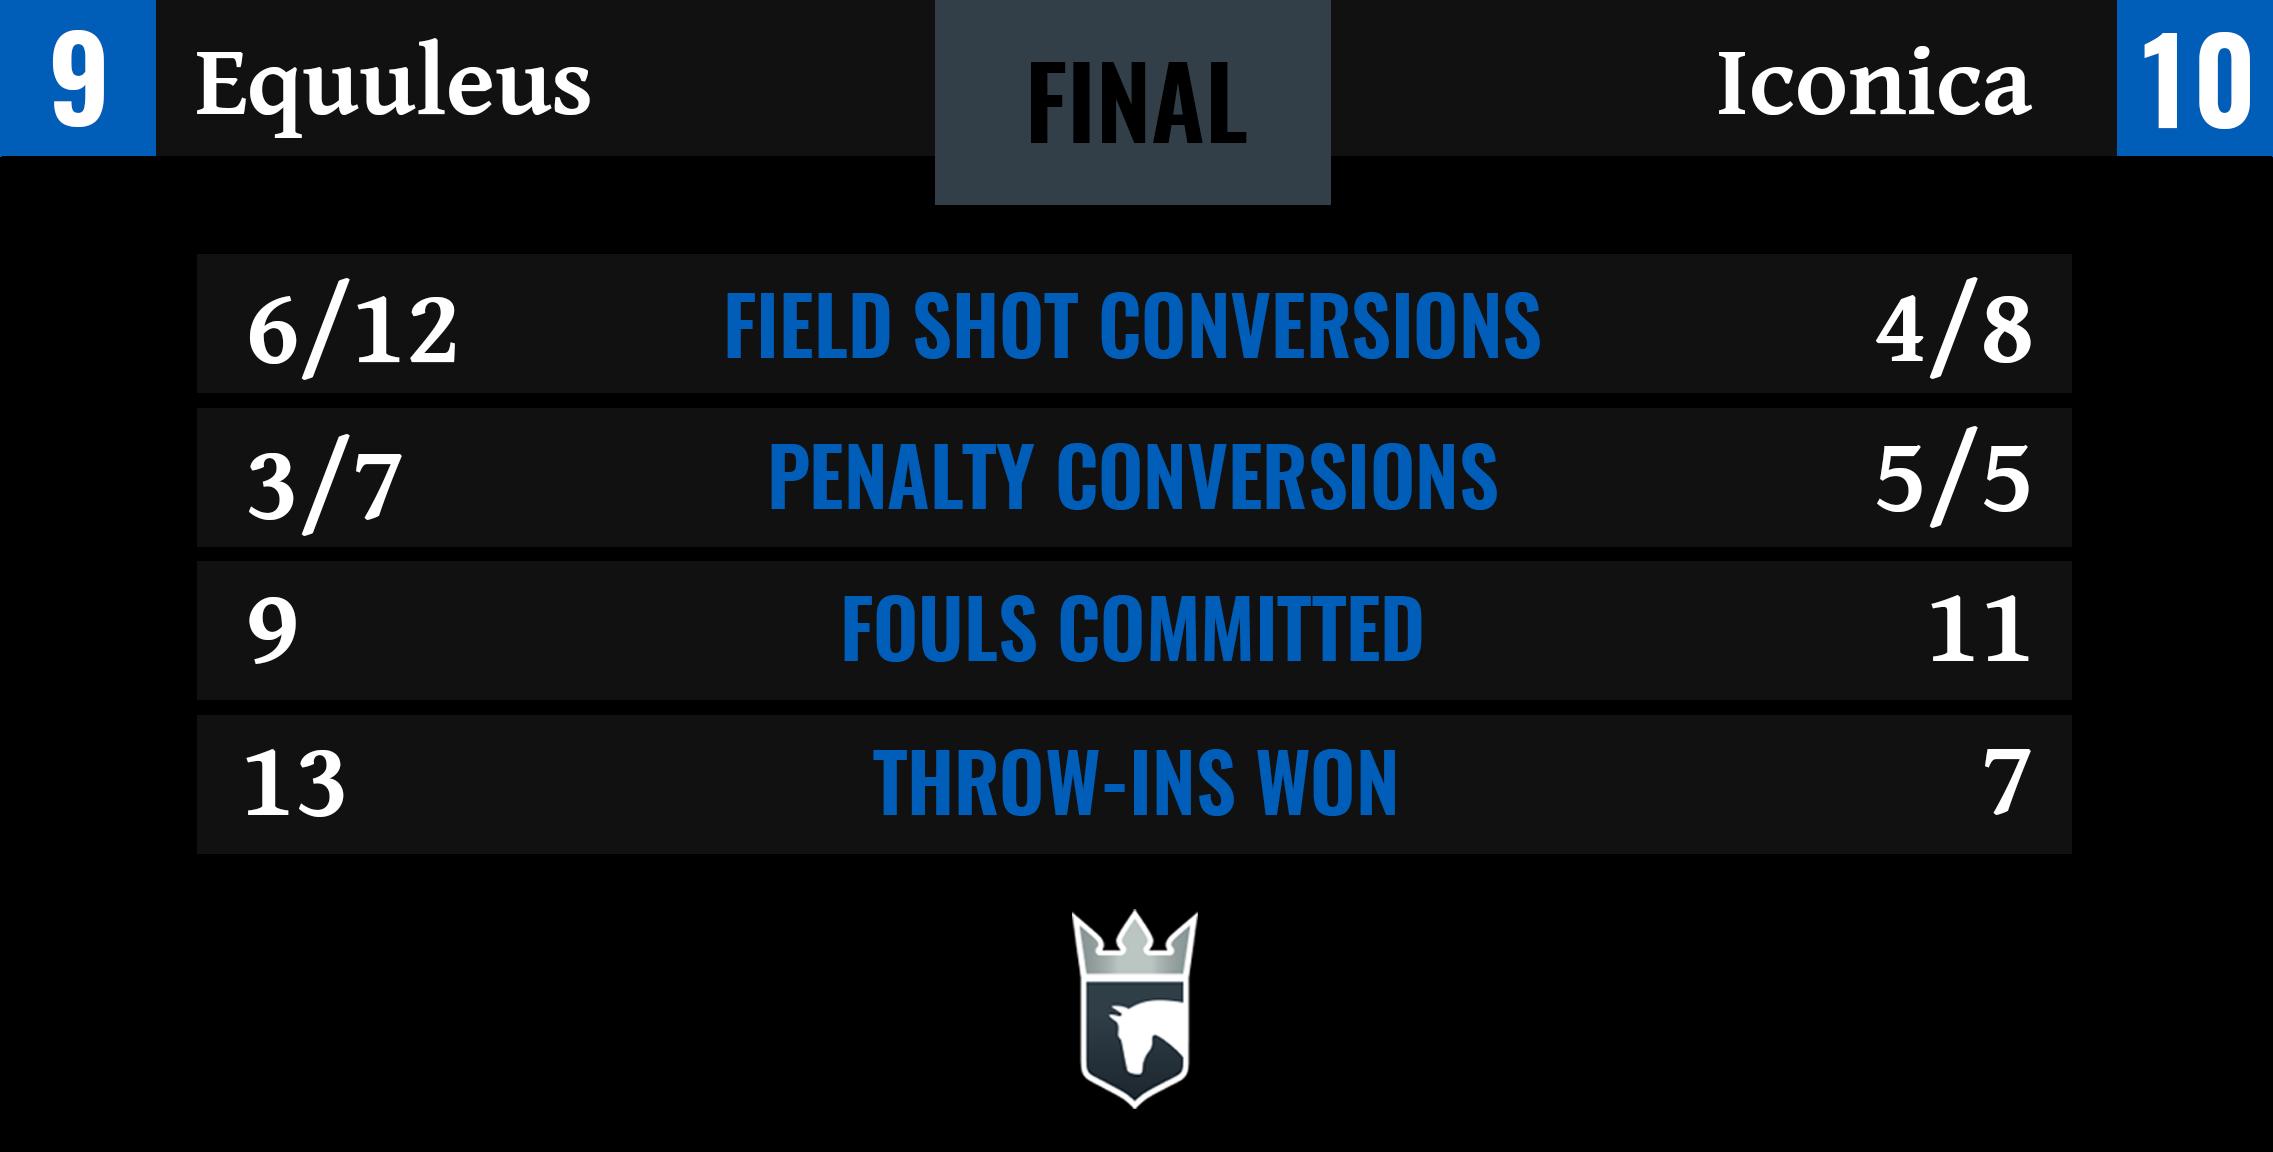 Equuleus vs Iconica Final Stats